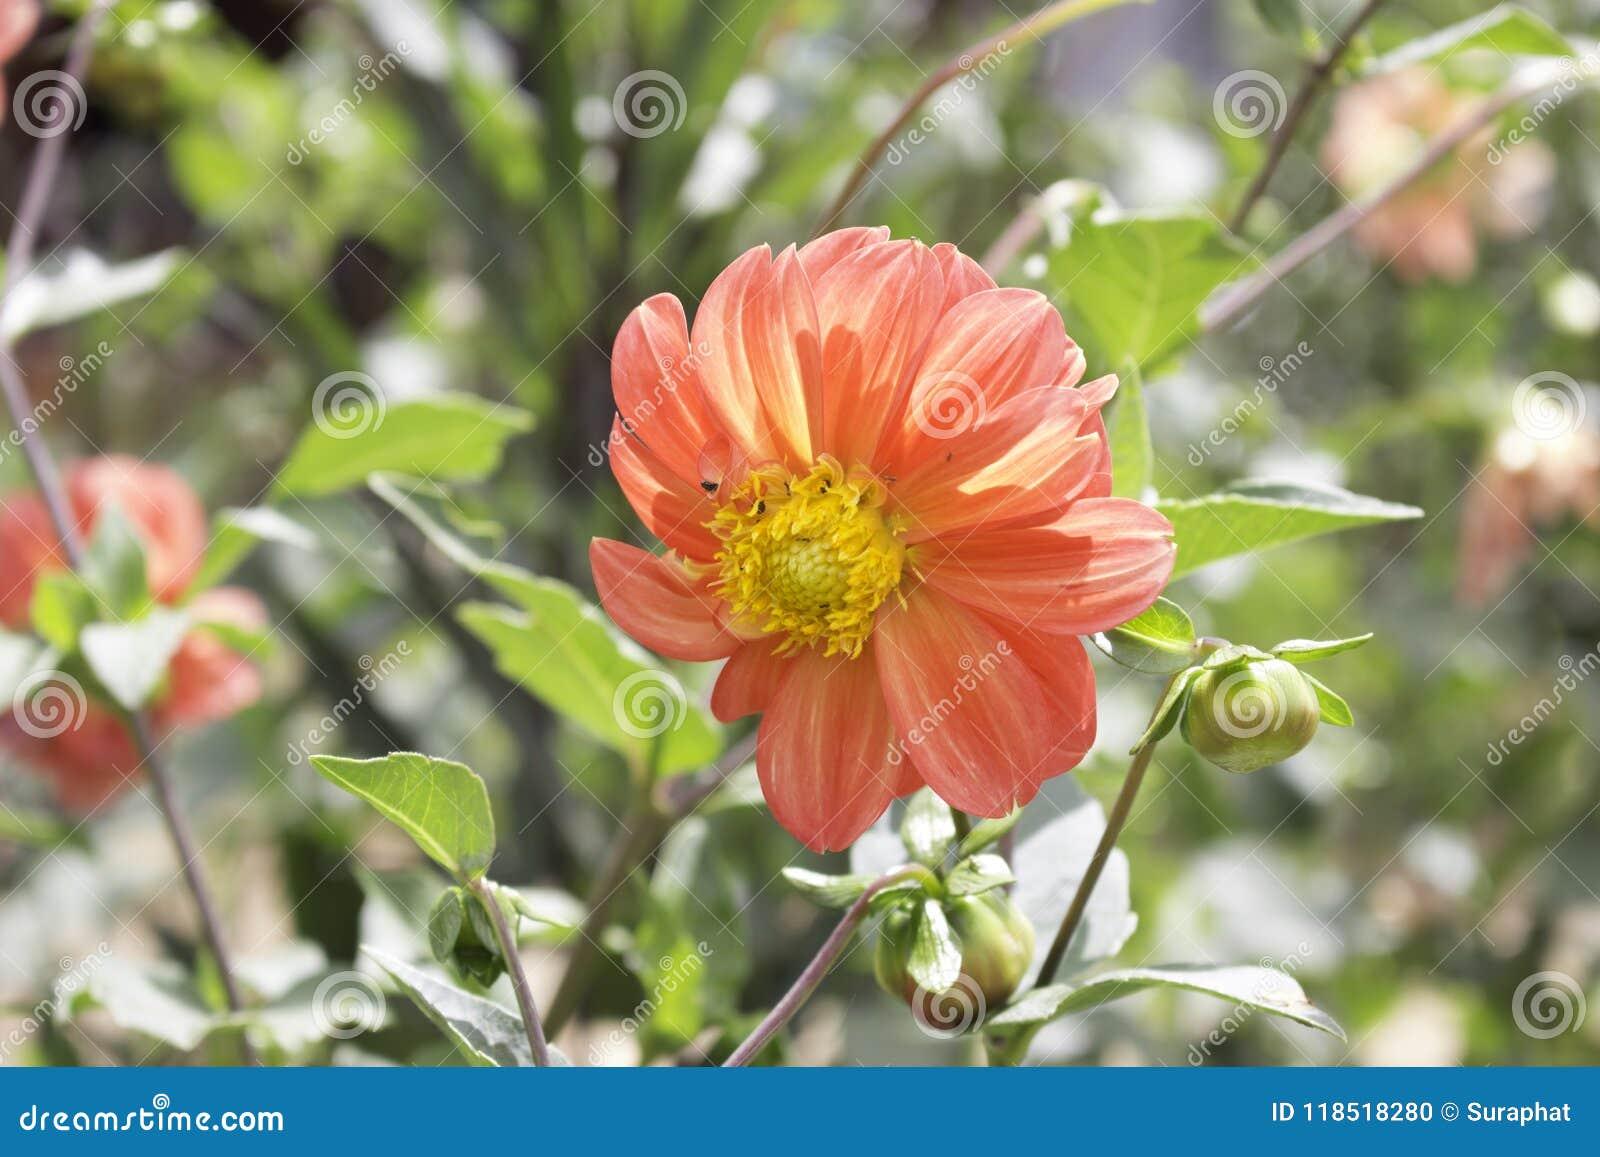 Dahlia is a genus of bushy tuberous herbaceous perennial plants dahlia is a genus of bushy tuberous herbaceous perennial plants native to mexico mightylinksfo